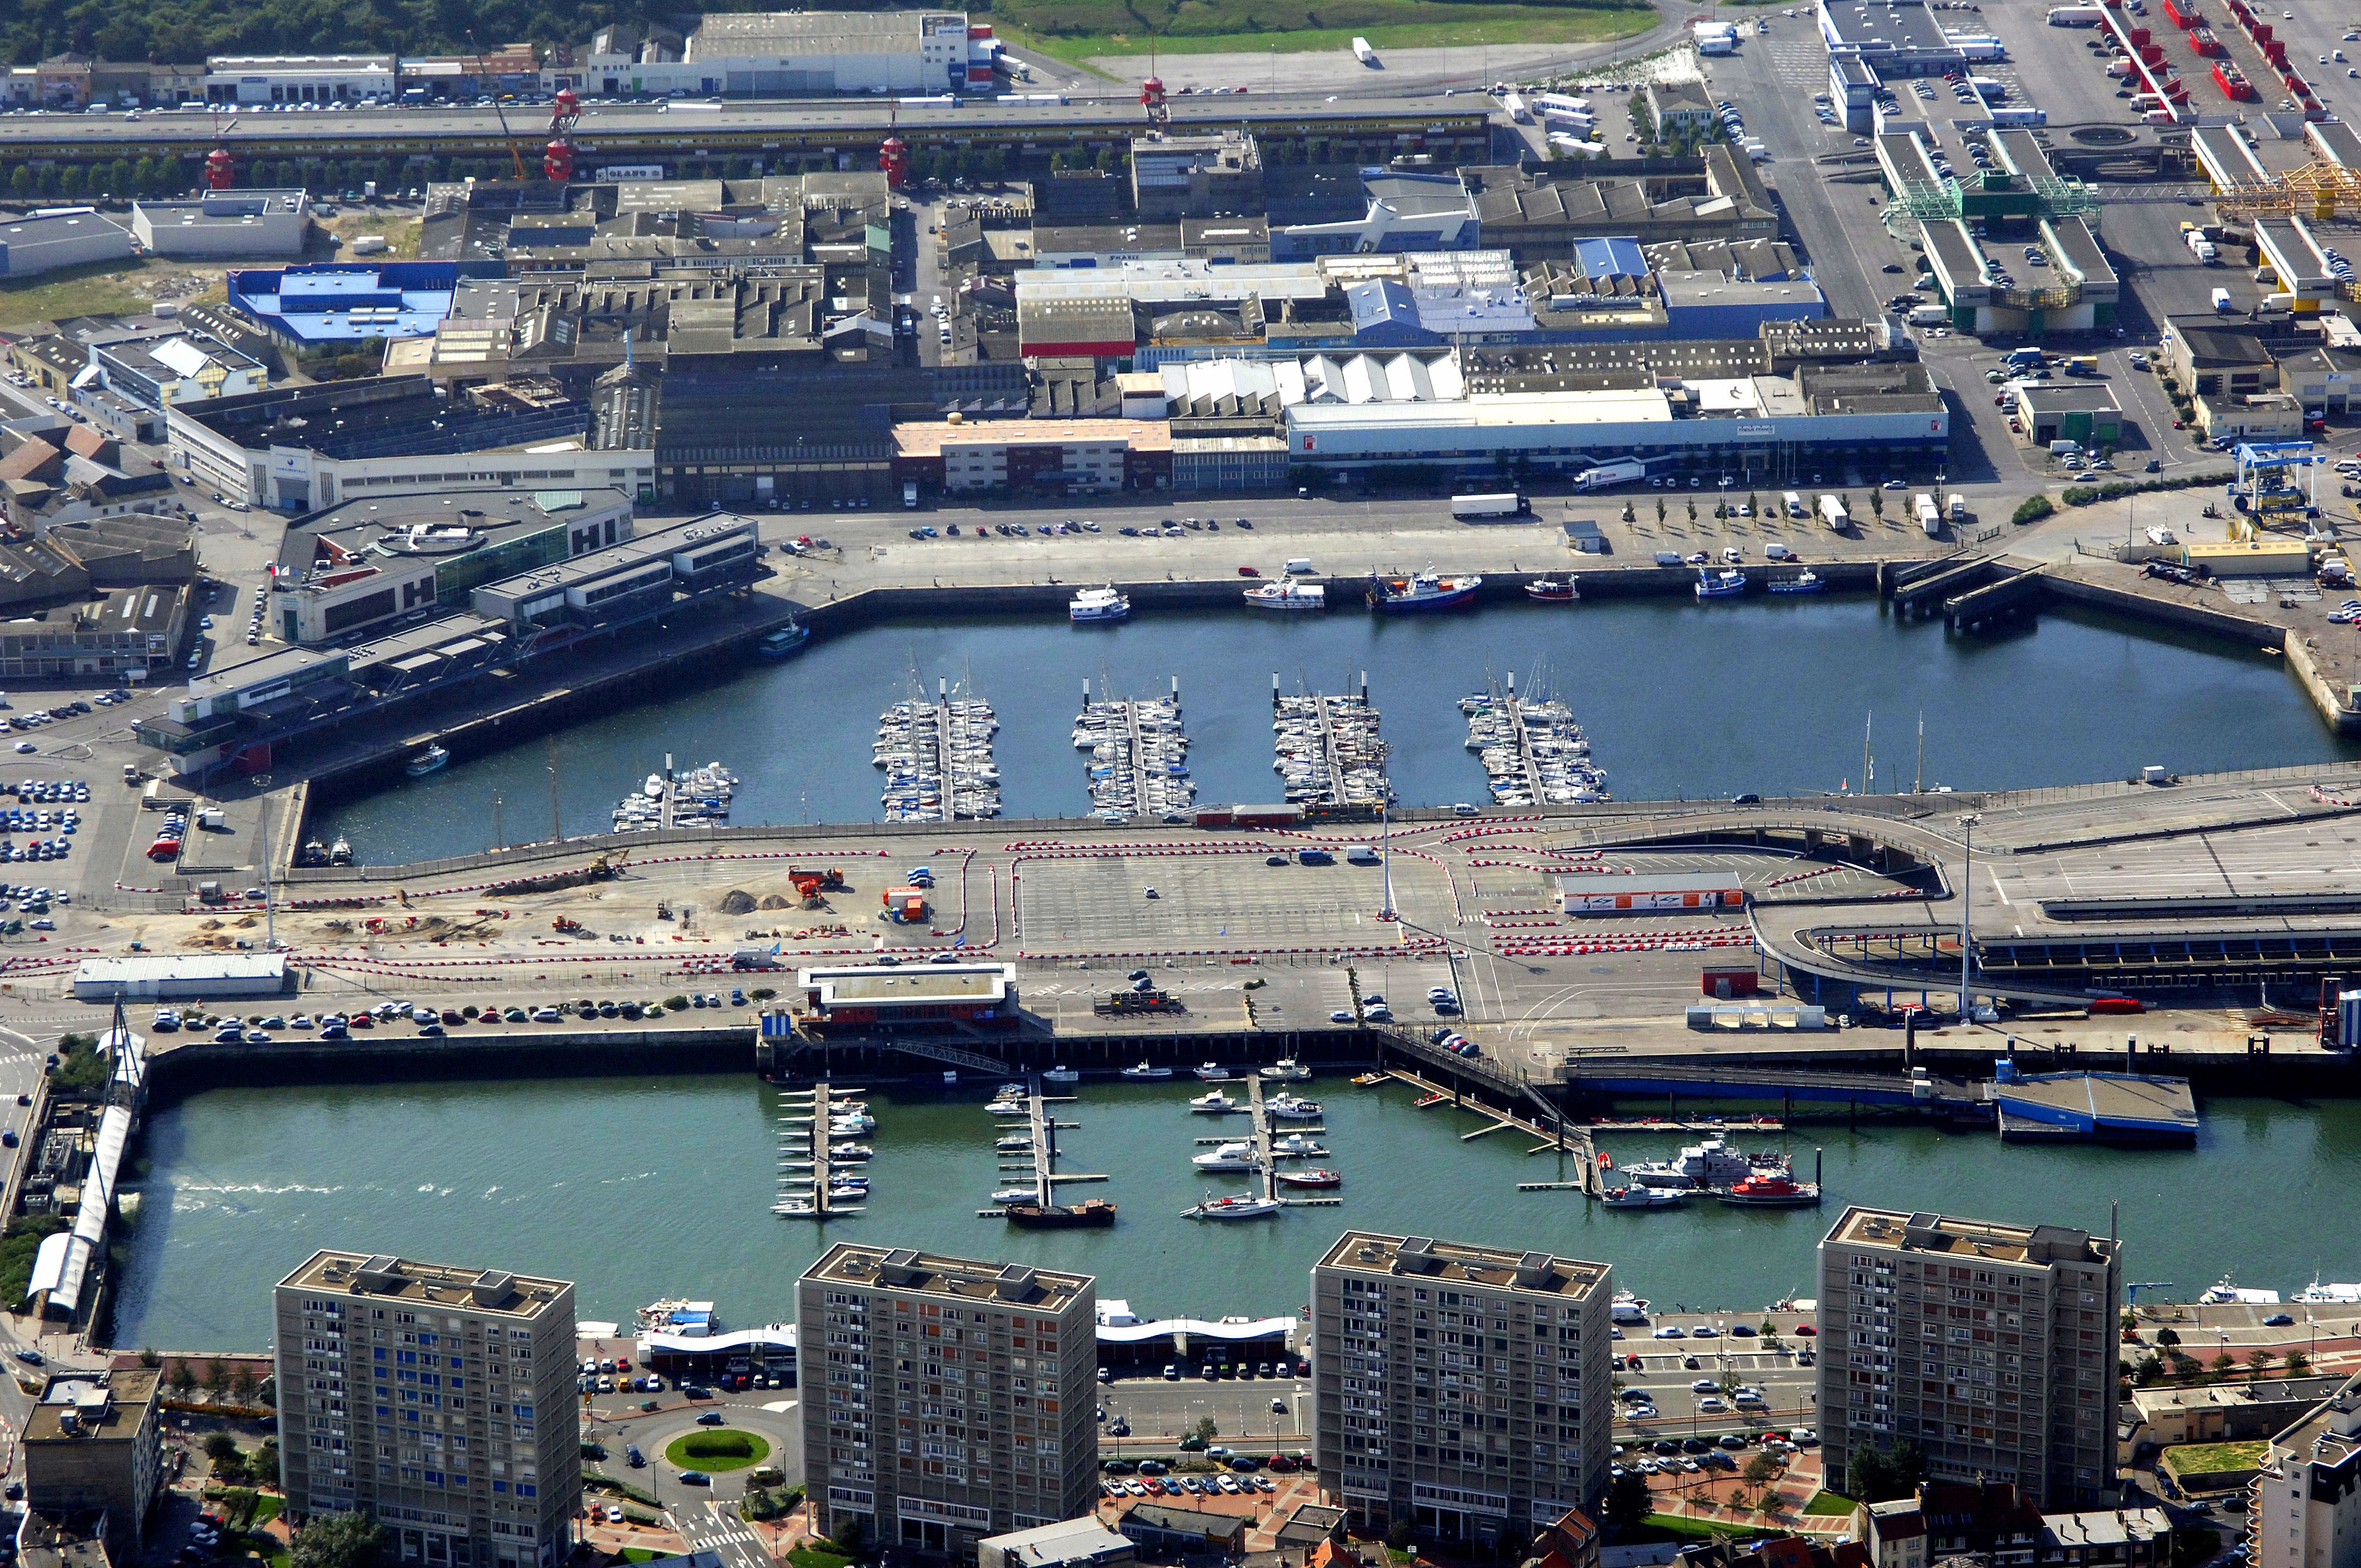 Port de plaisance bassin napoleon in boulogne sur mer france marina reviews phone number - Port de plaisance de boulogne sur mer ...